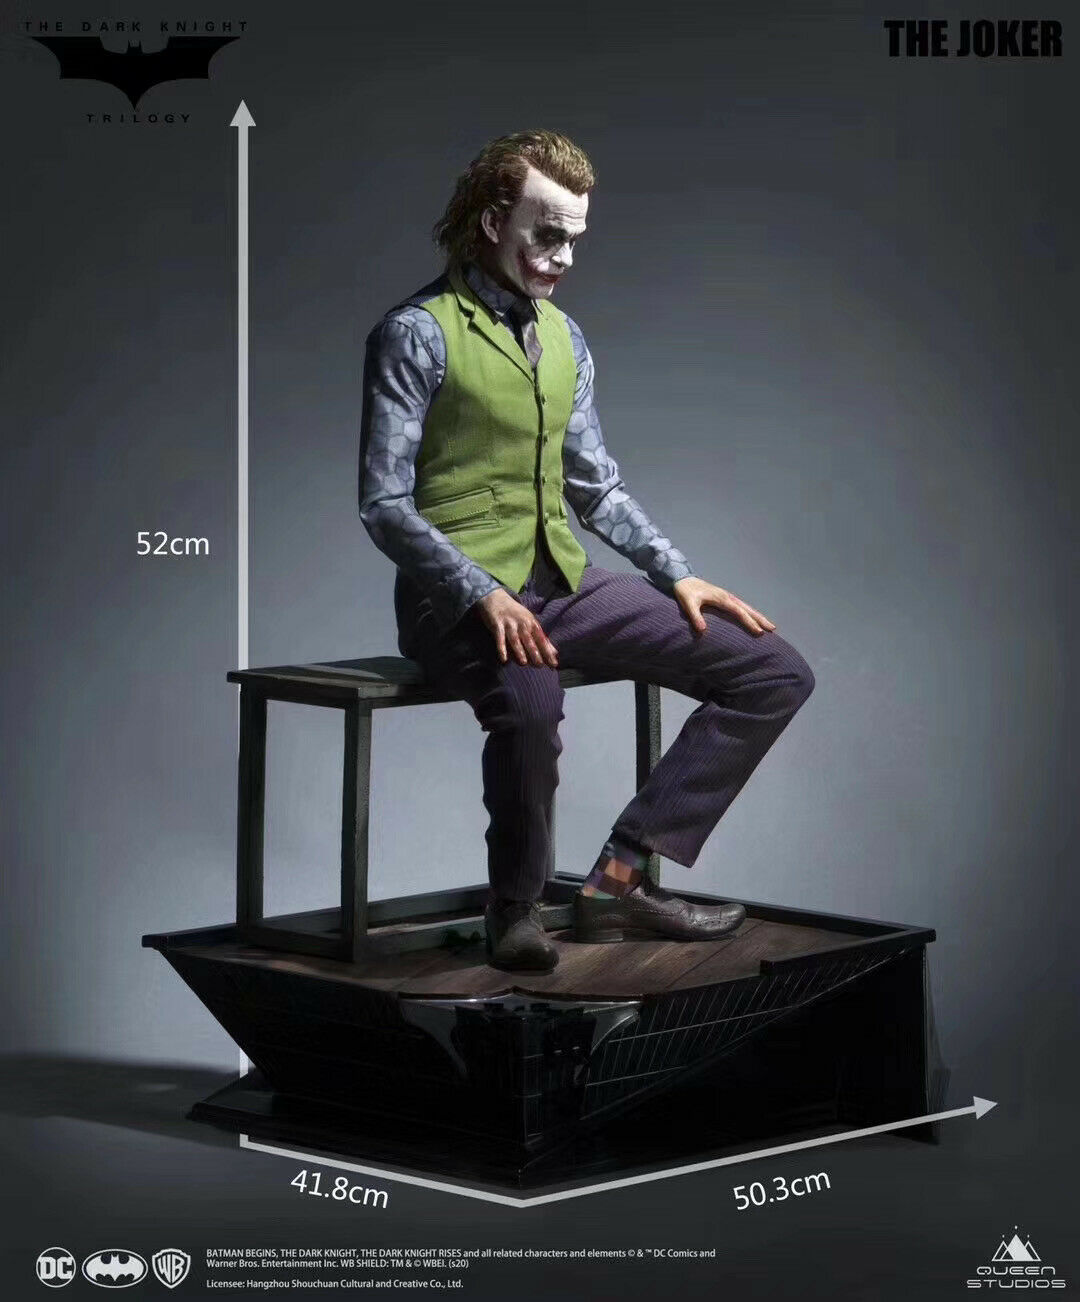 Estátua Coringa Joker: Trilogia O Cavaleiro Das Trevas Batman - Queen Studios